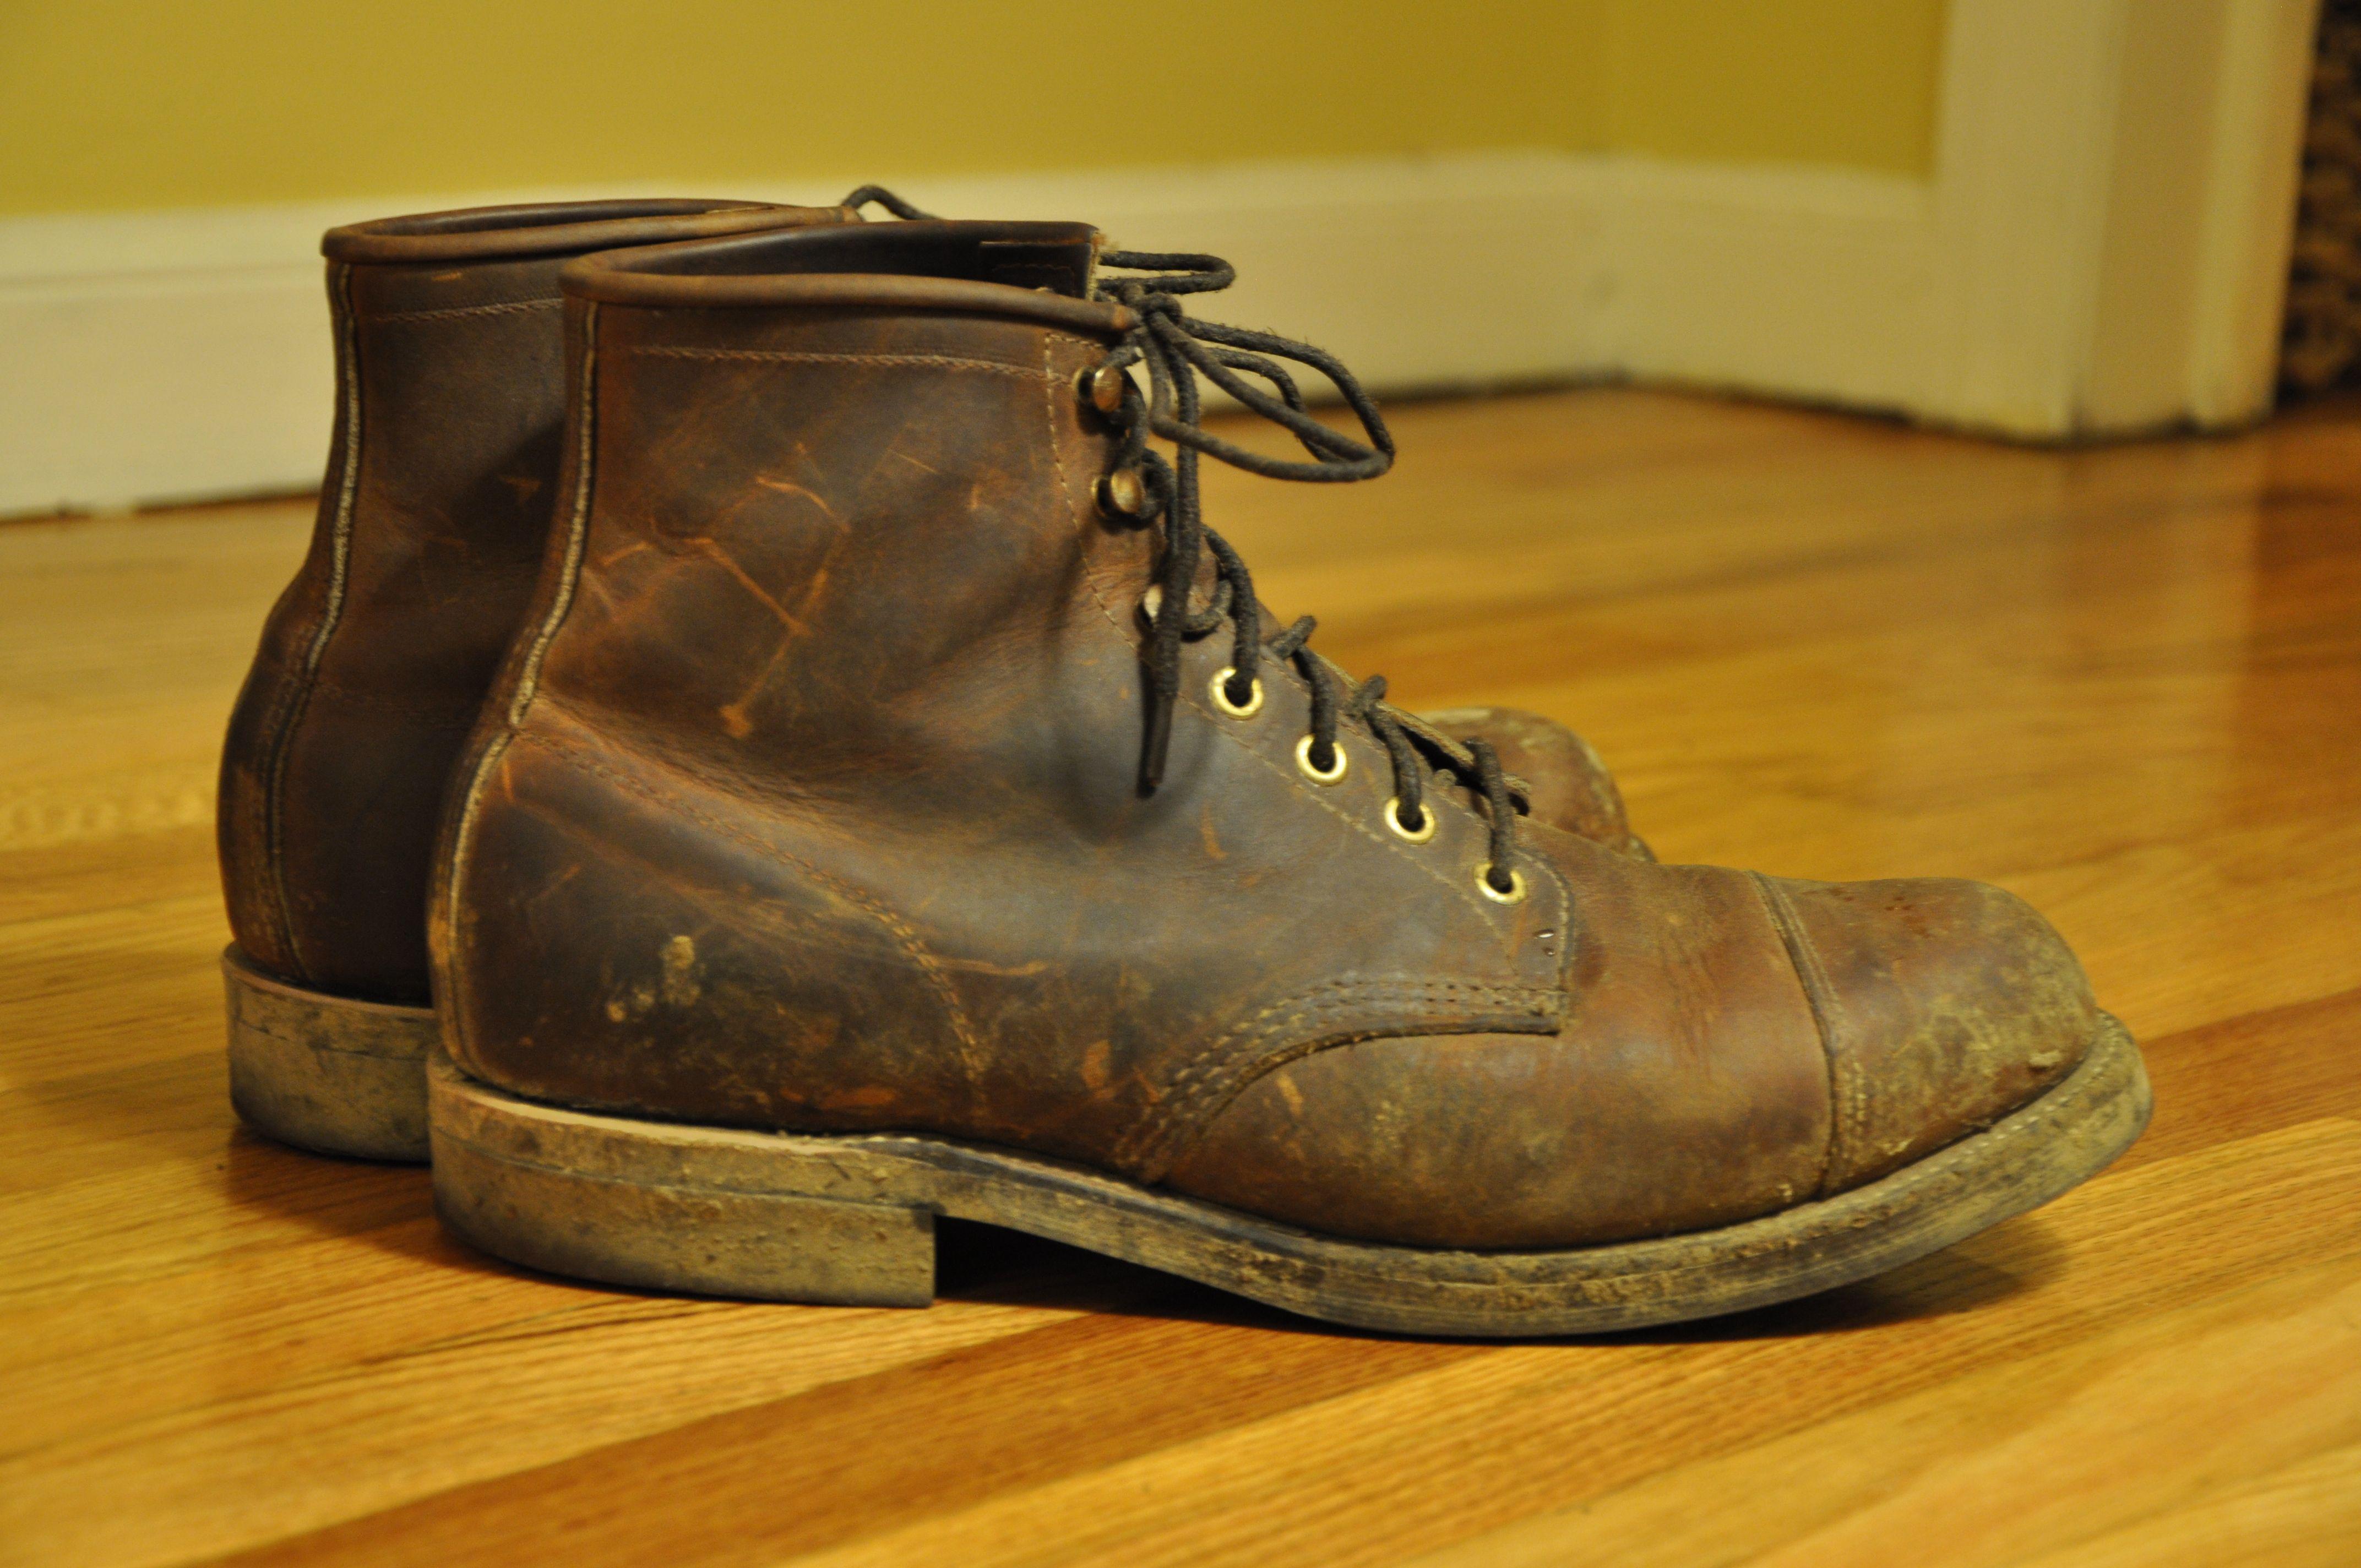 b3d42b7bf67 ll bean engineer boots | Shoes in 2019 | Boots, Ll bean boots, Ll ...